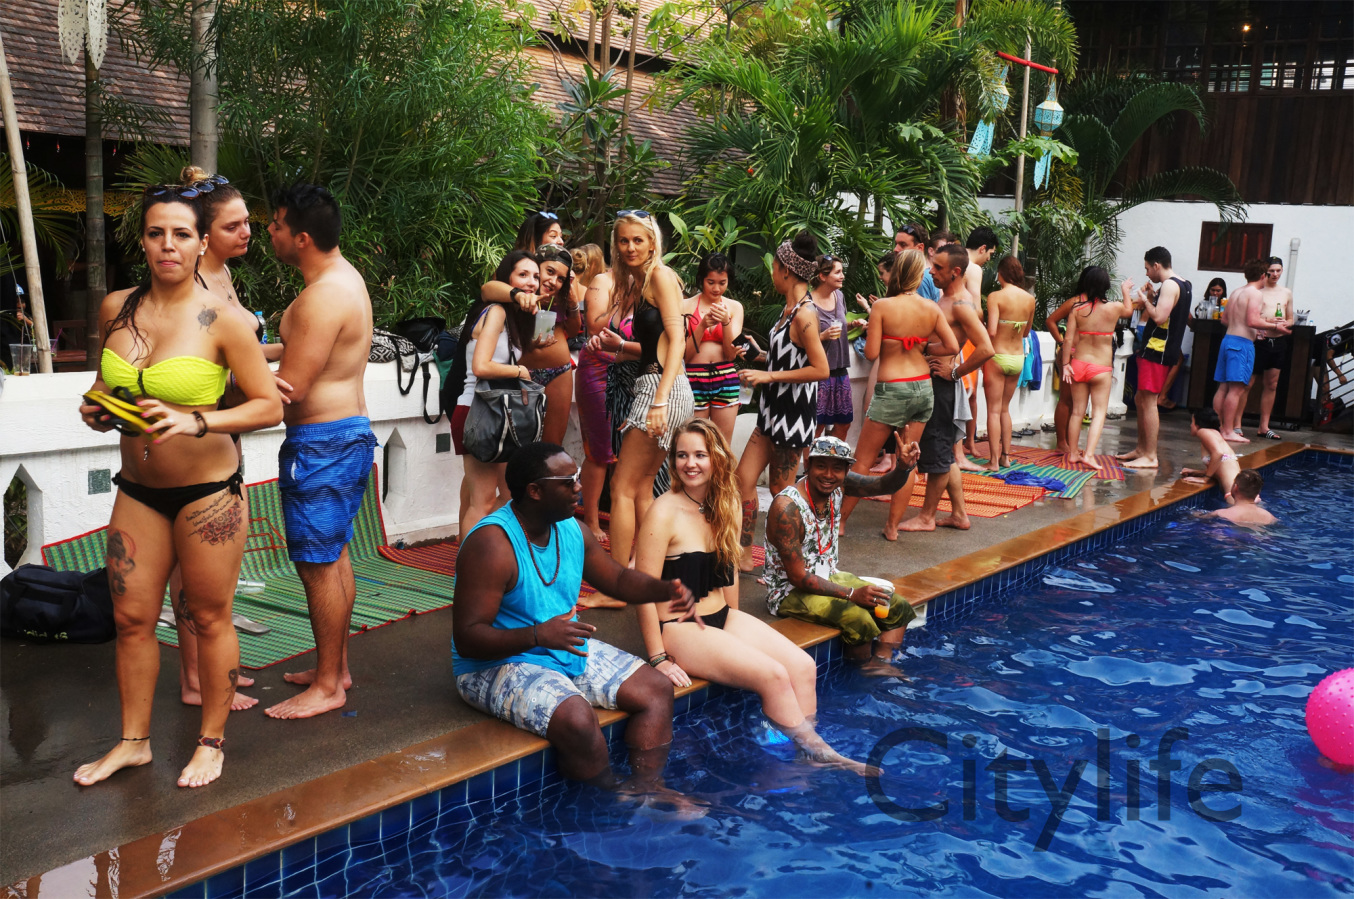 Chiang mai soical pics deejai garden pool party for Garden pool pdf